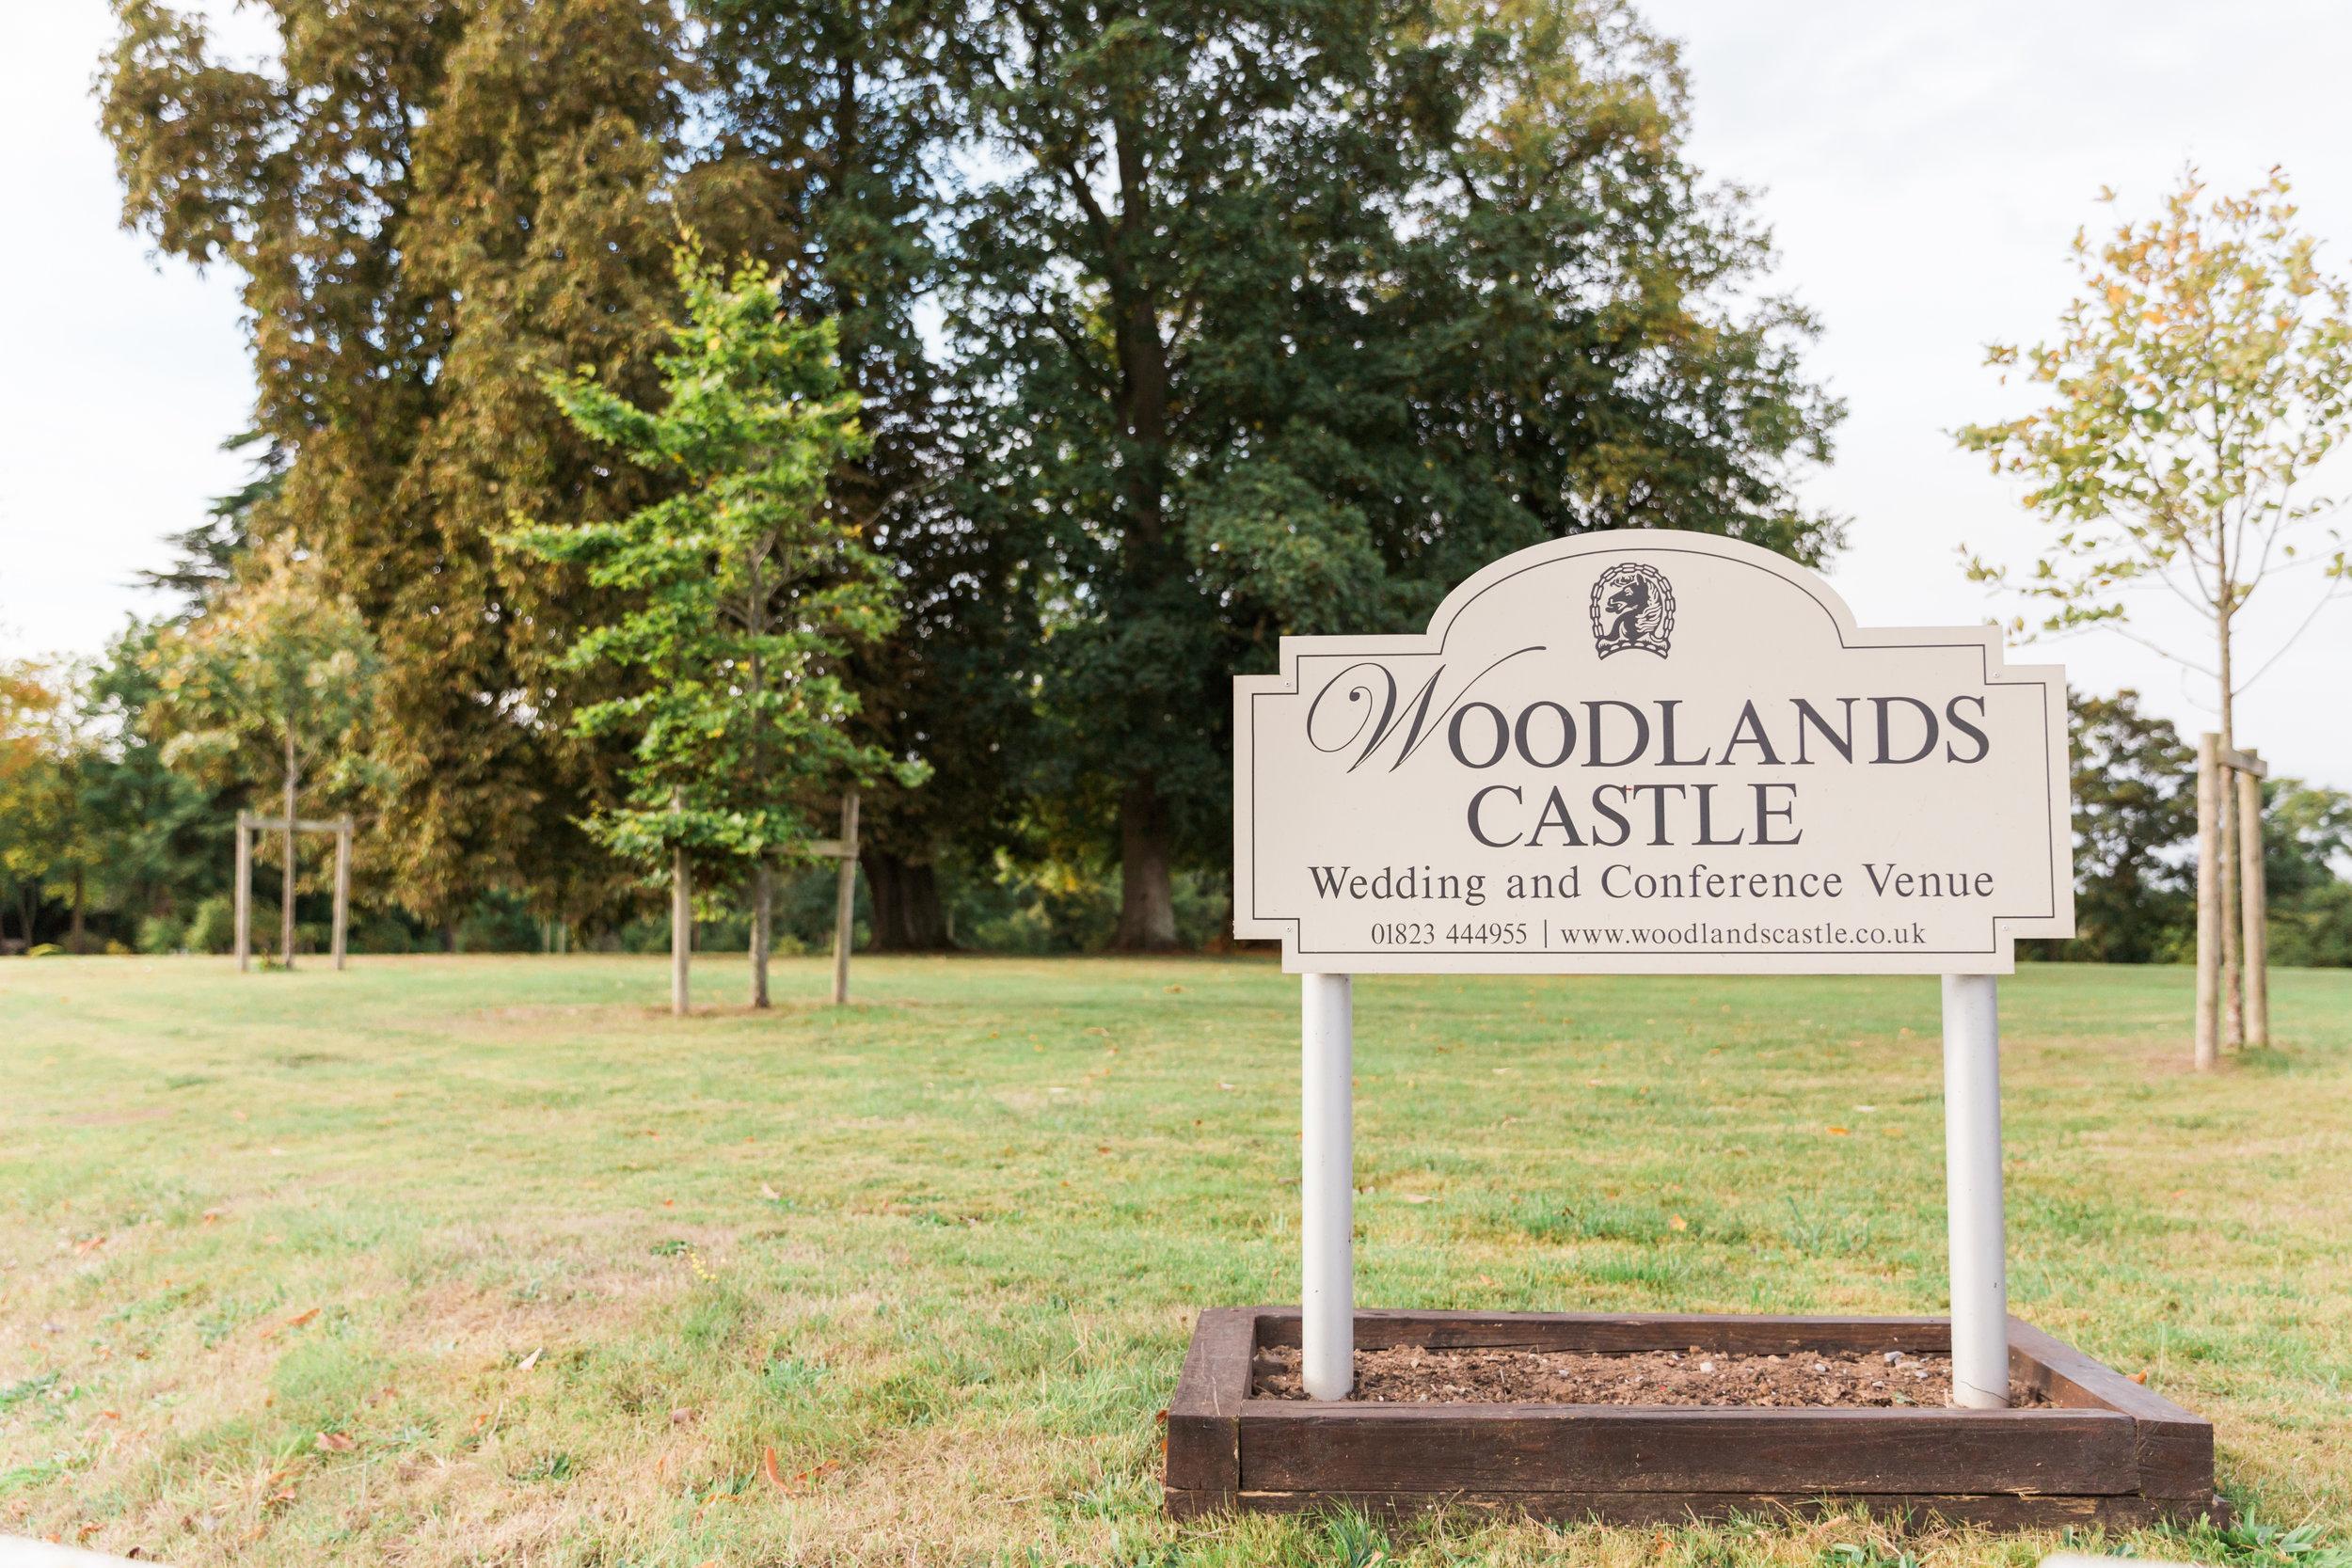 woodlands castle photography.jpg